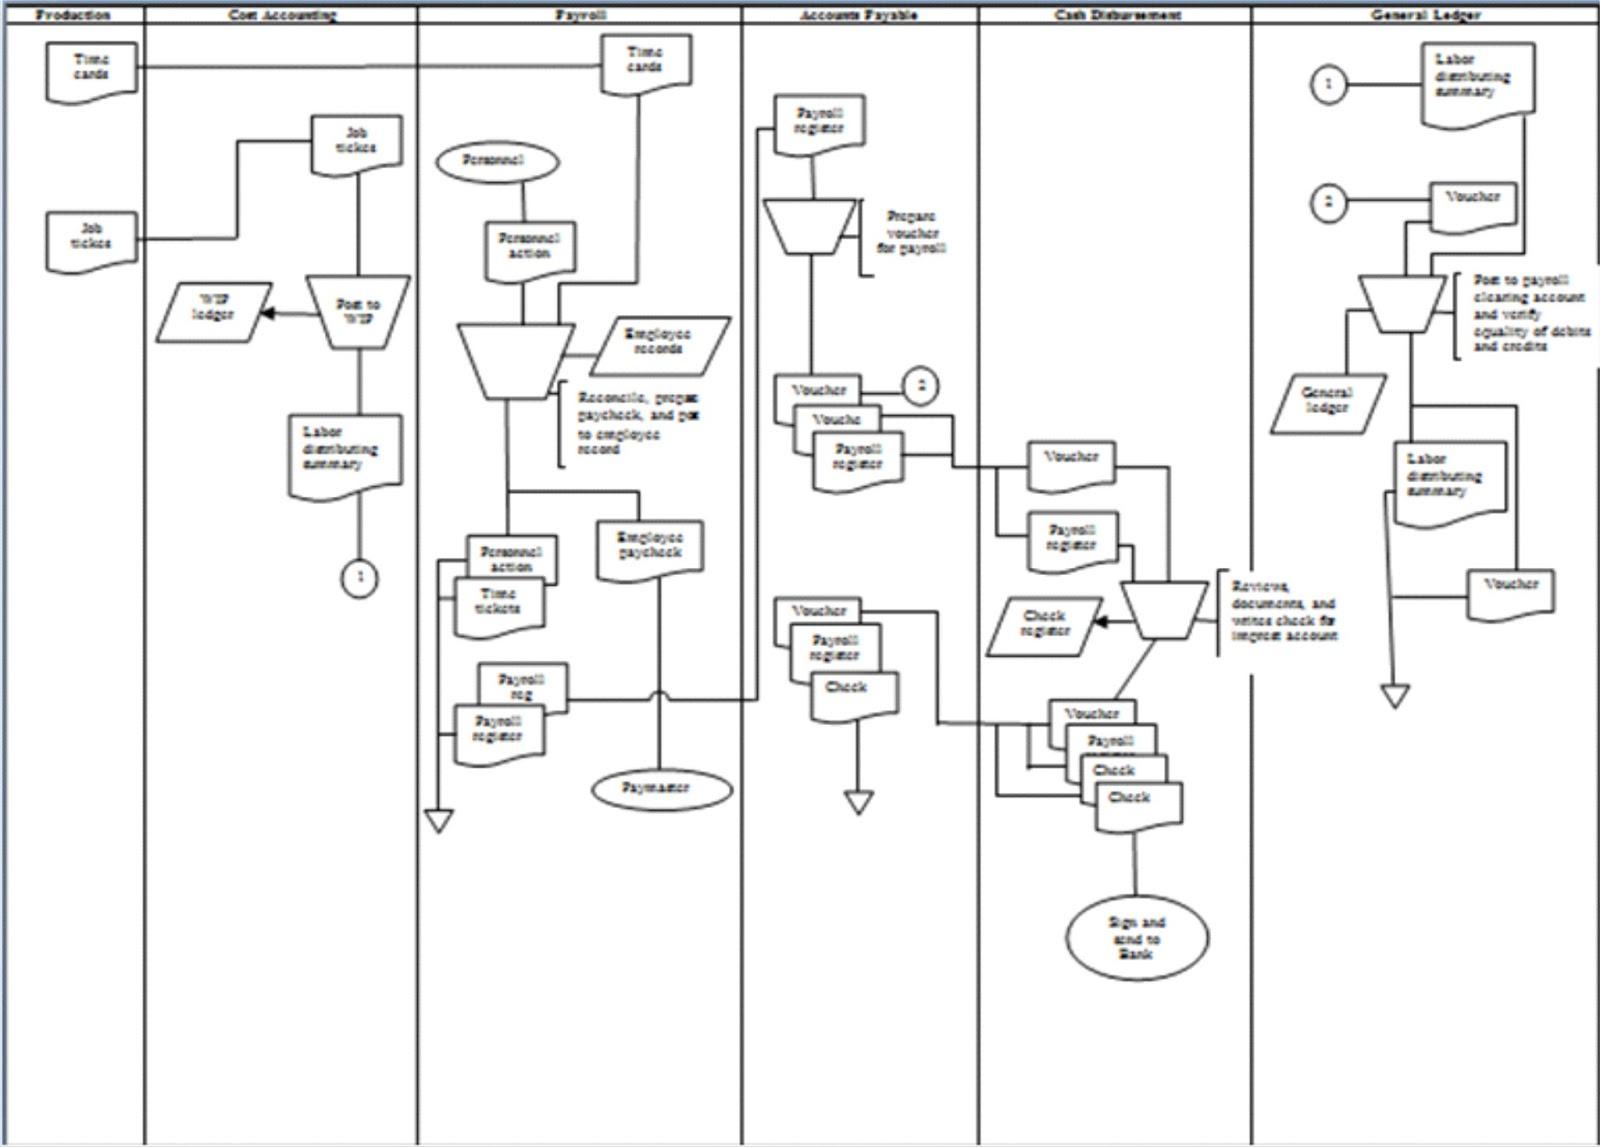 Rosalie Hapsari  Data Flow Diagram  Dfd  And Flowchart